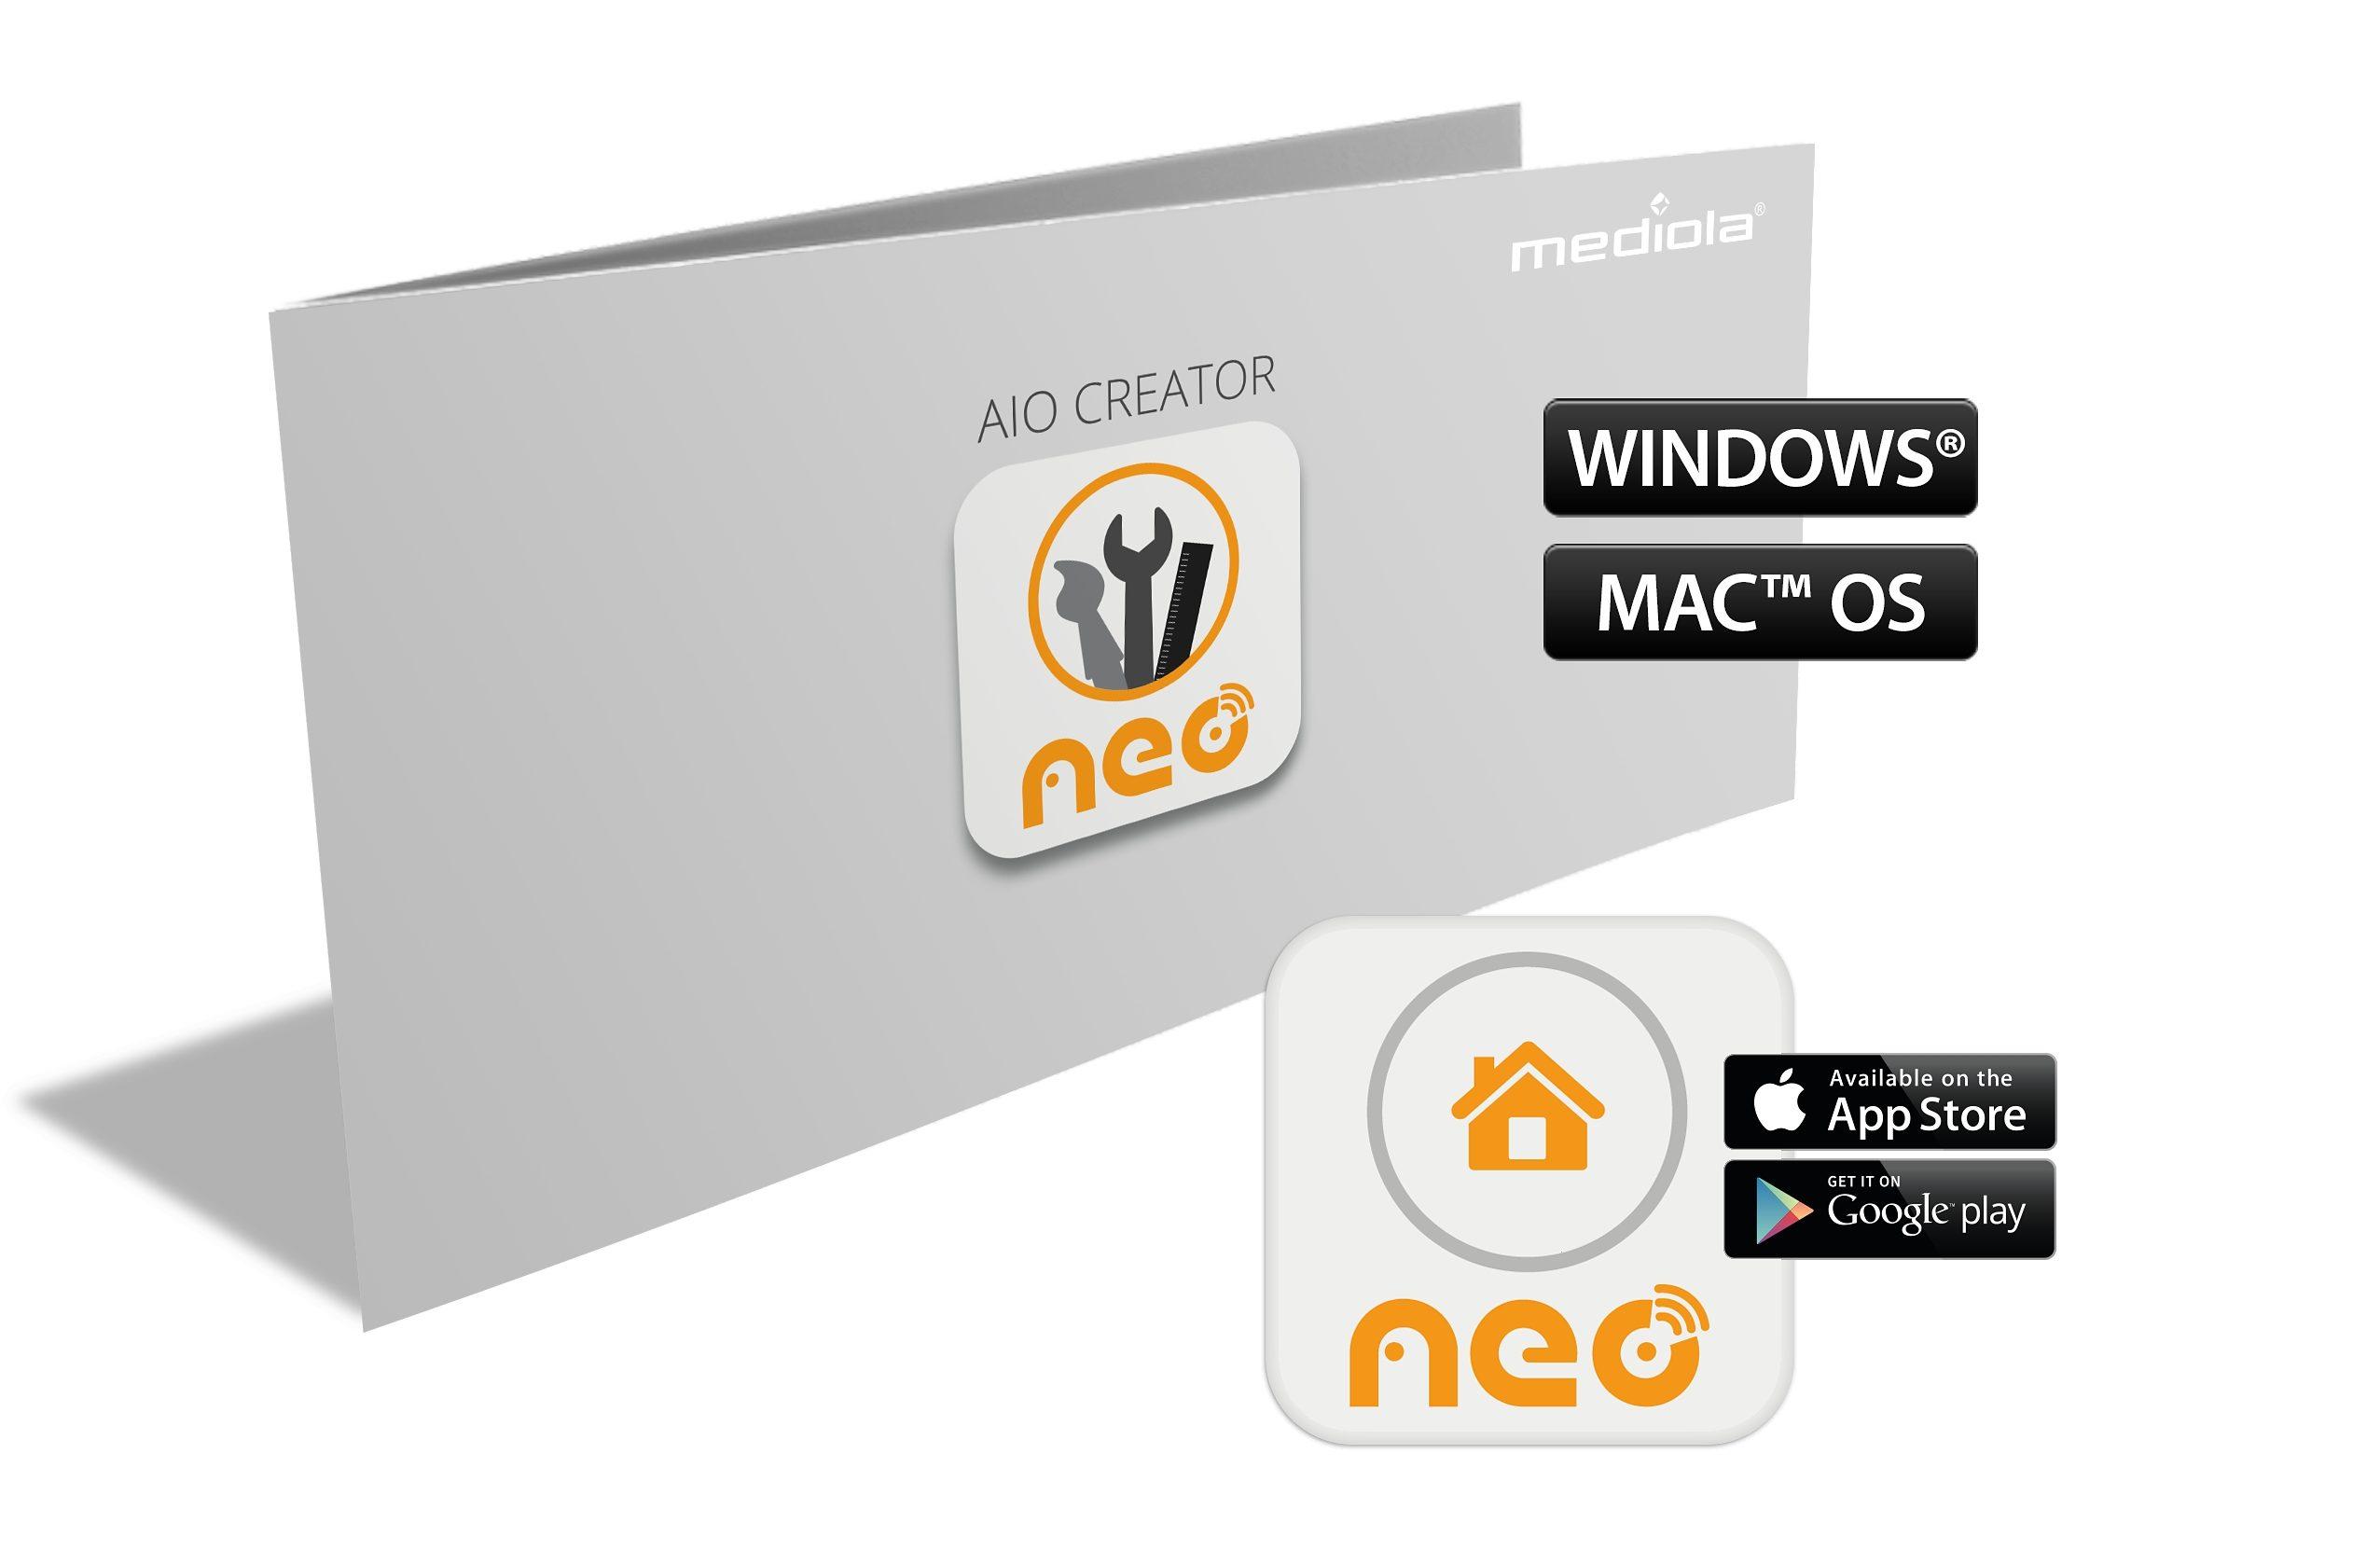 Mediola Smart Home Steuerung & Komfort »AIO Creator NEO mediola Edition«